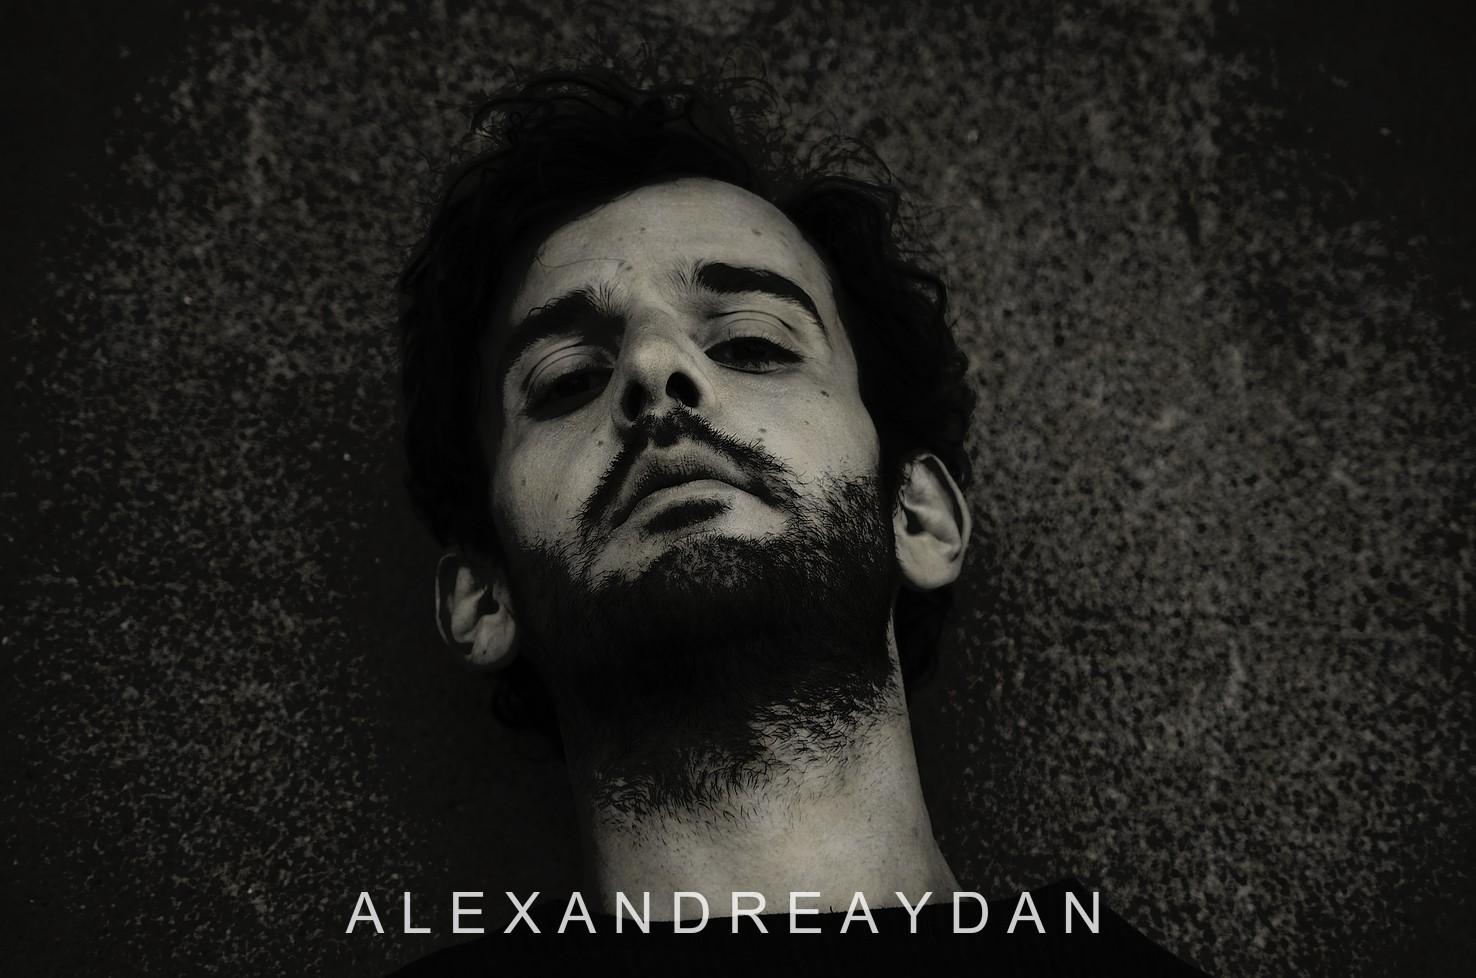 Alexandre Aydan